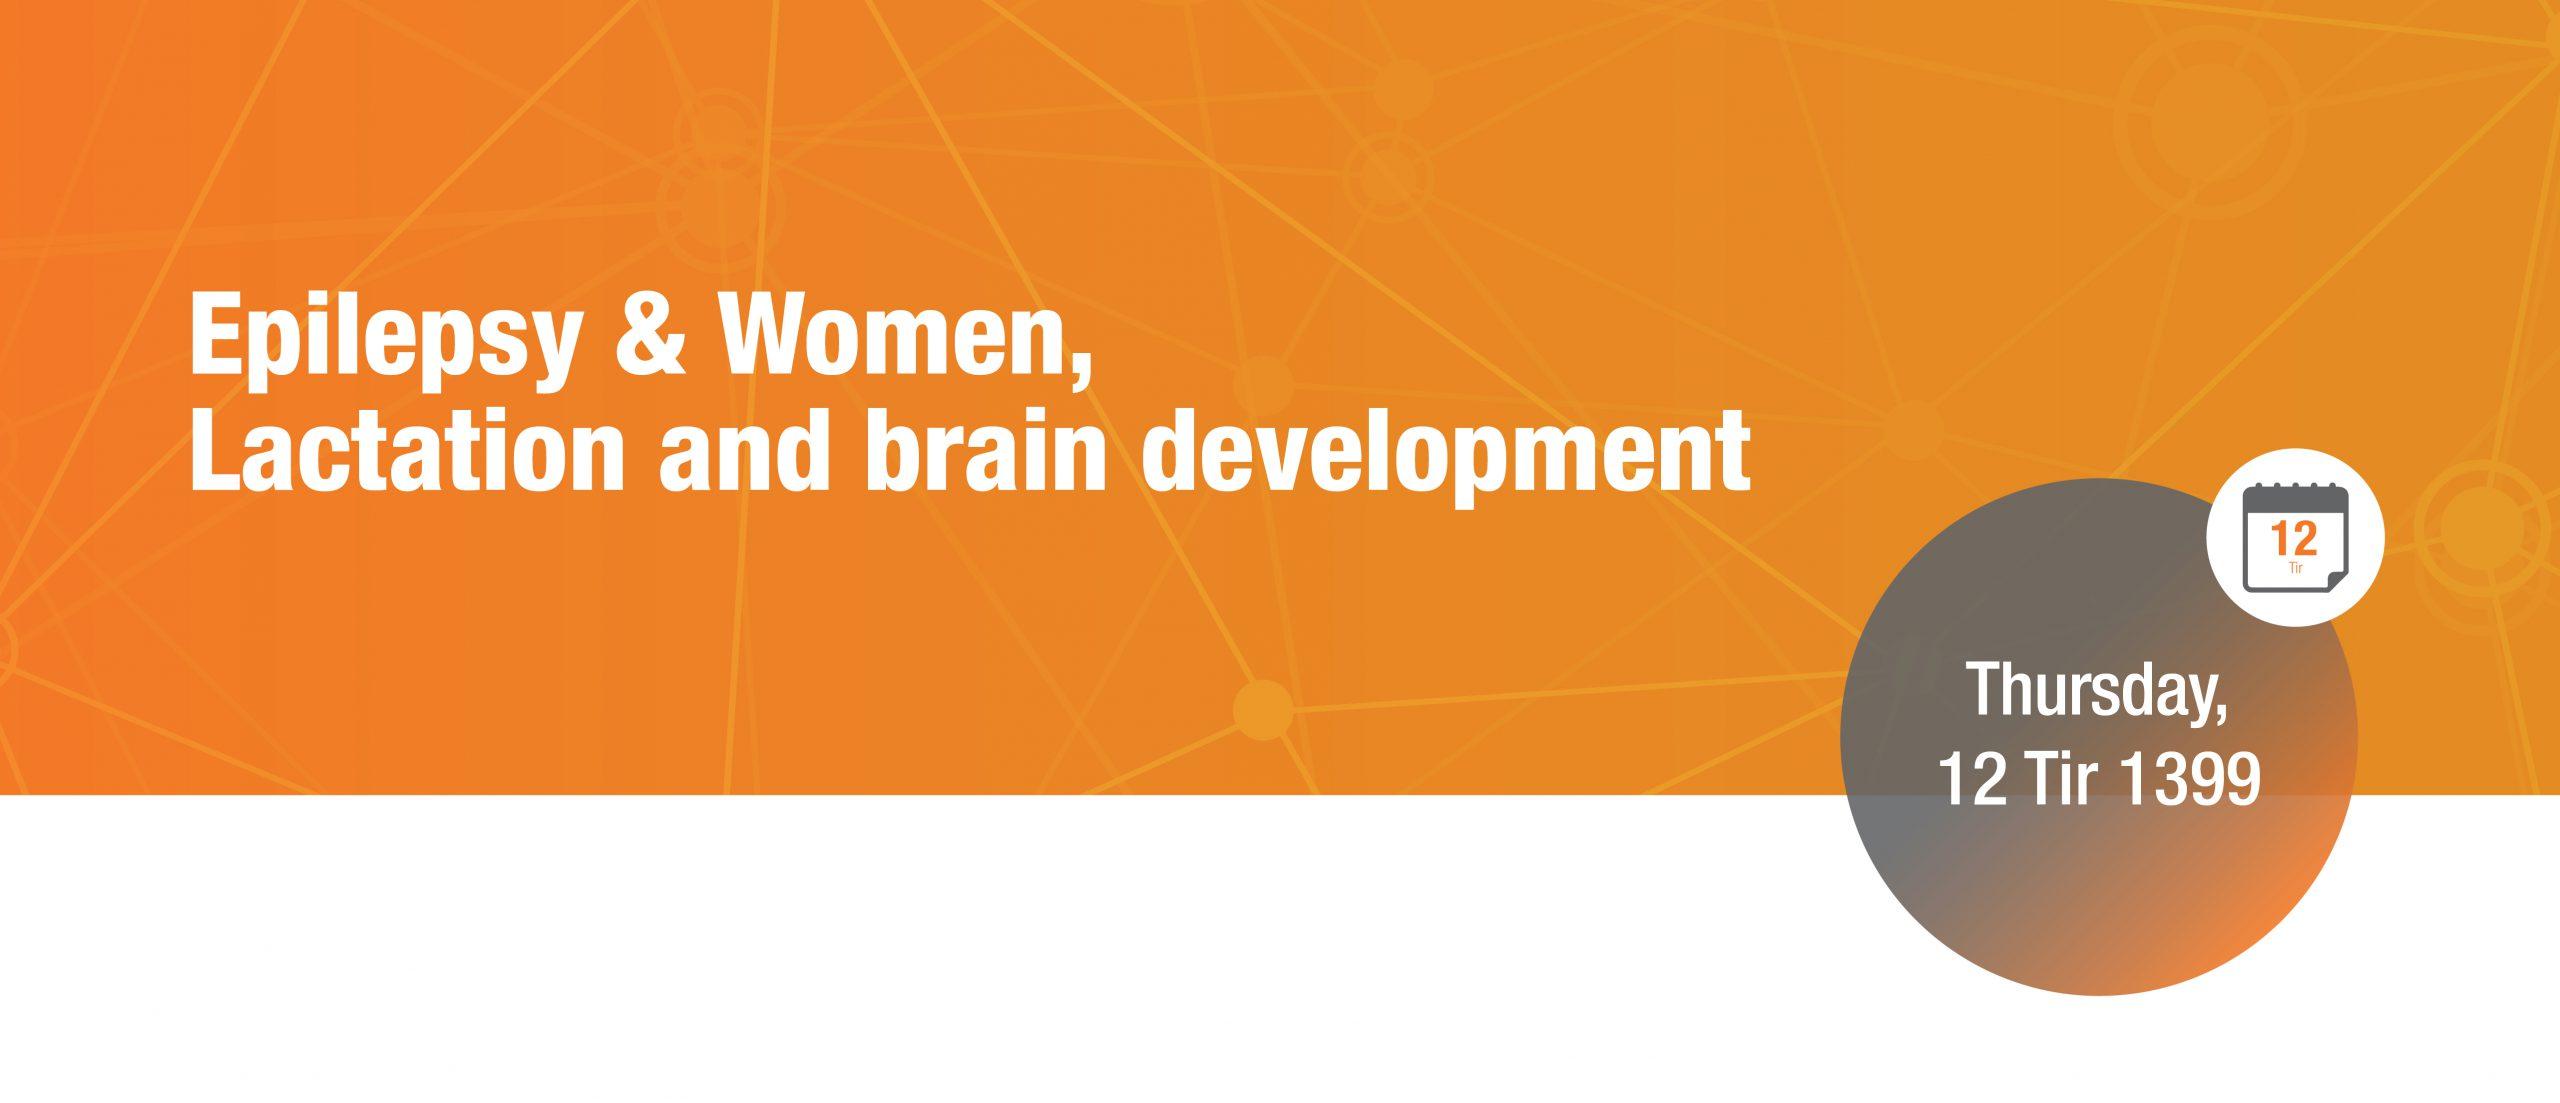 Epilepsy & Women, Lactation and brain development